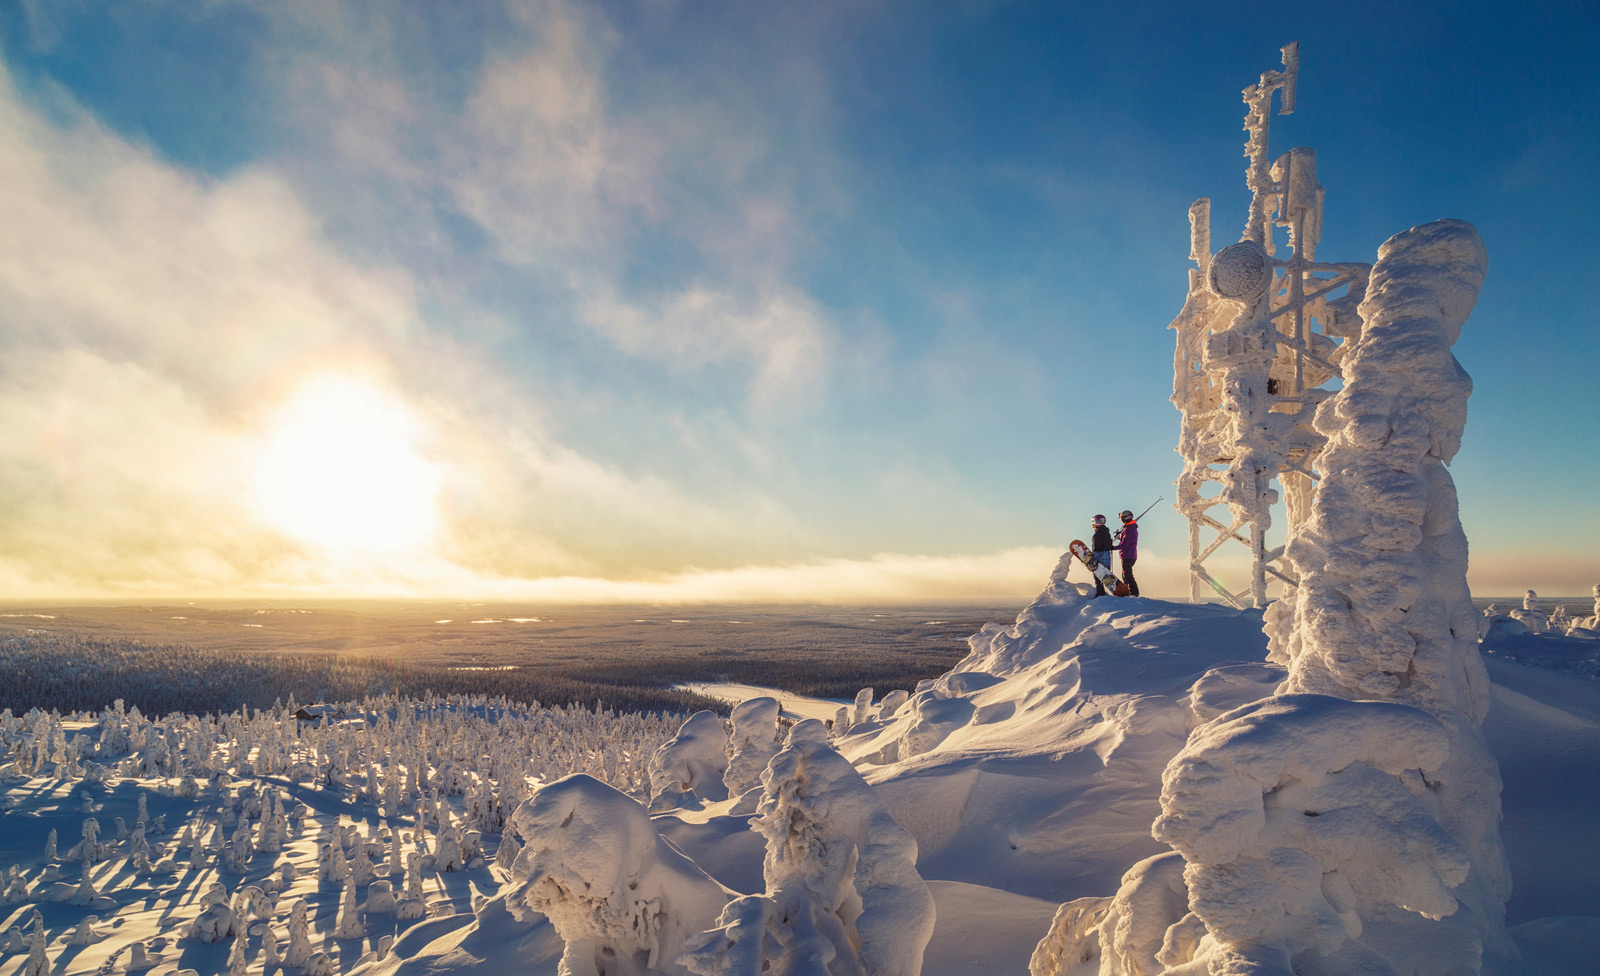 Iso-Syöte Ski Resort